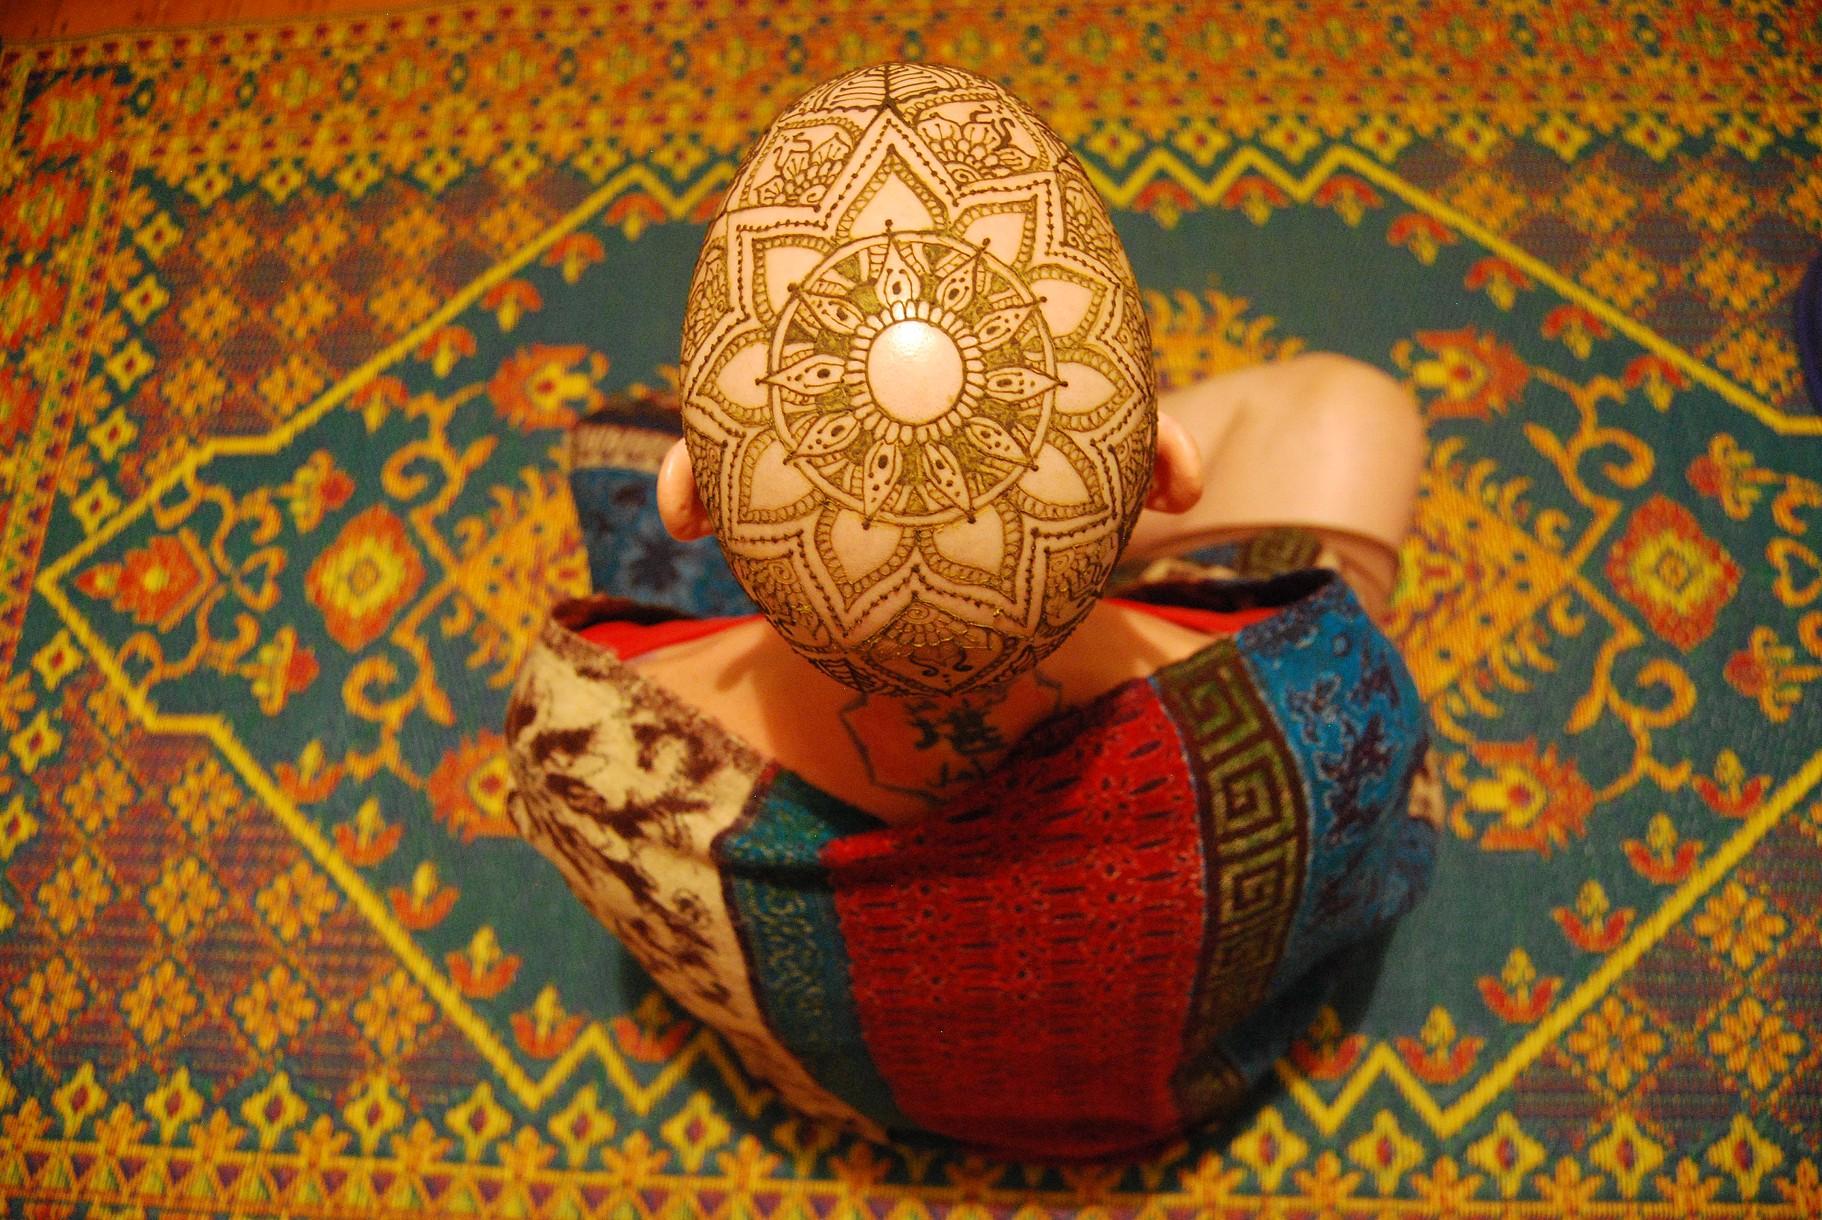 ADA SOLOMON - ARTIST (Henna, Portraiture, Decorative Objects